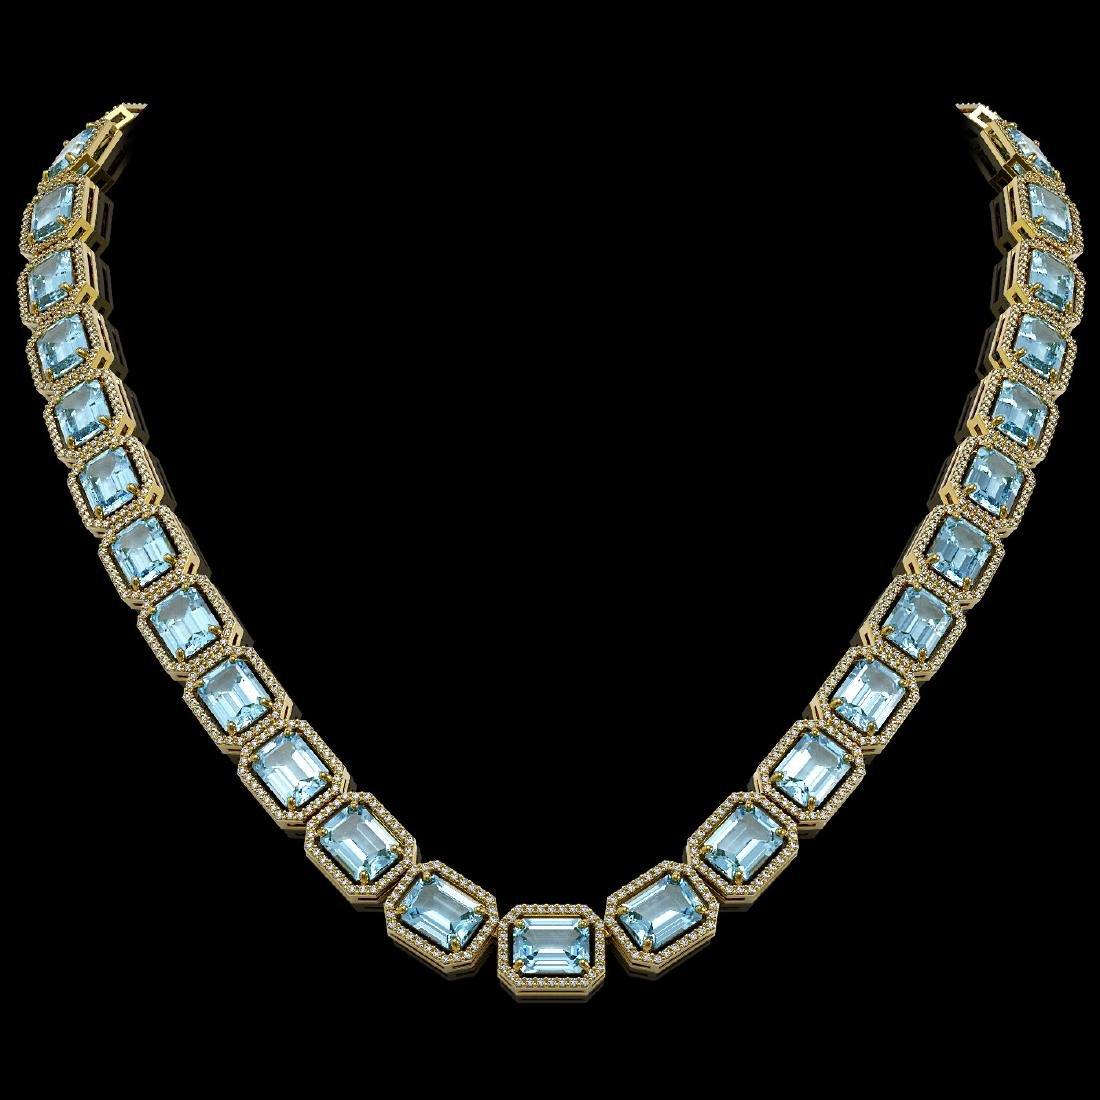 80.98 CTW Aquamarine & Diamond Halo Necklace 10K Yellow